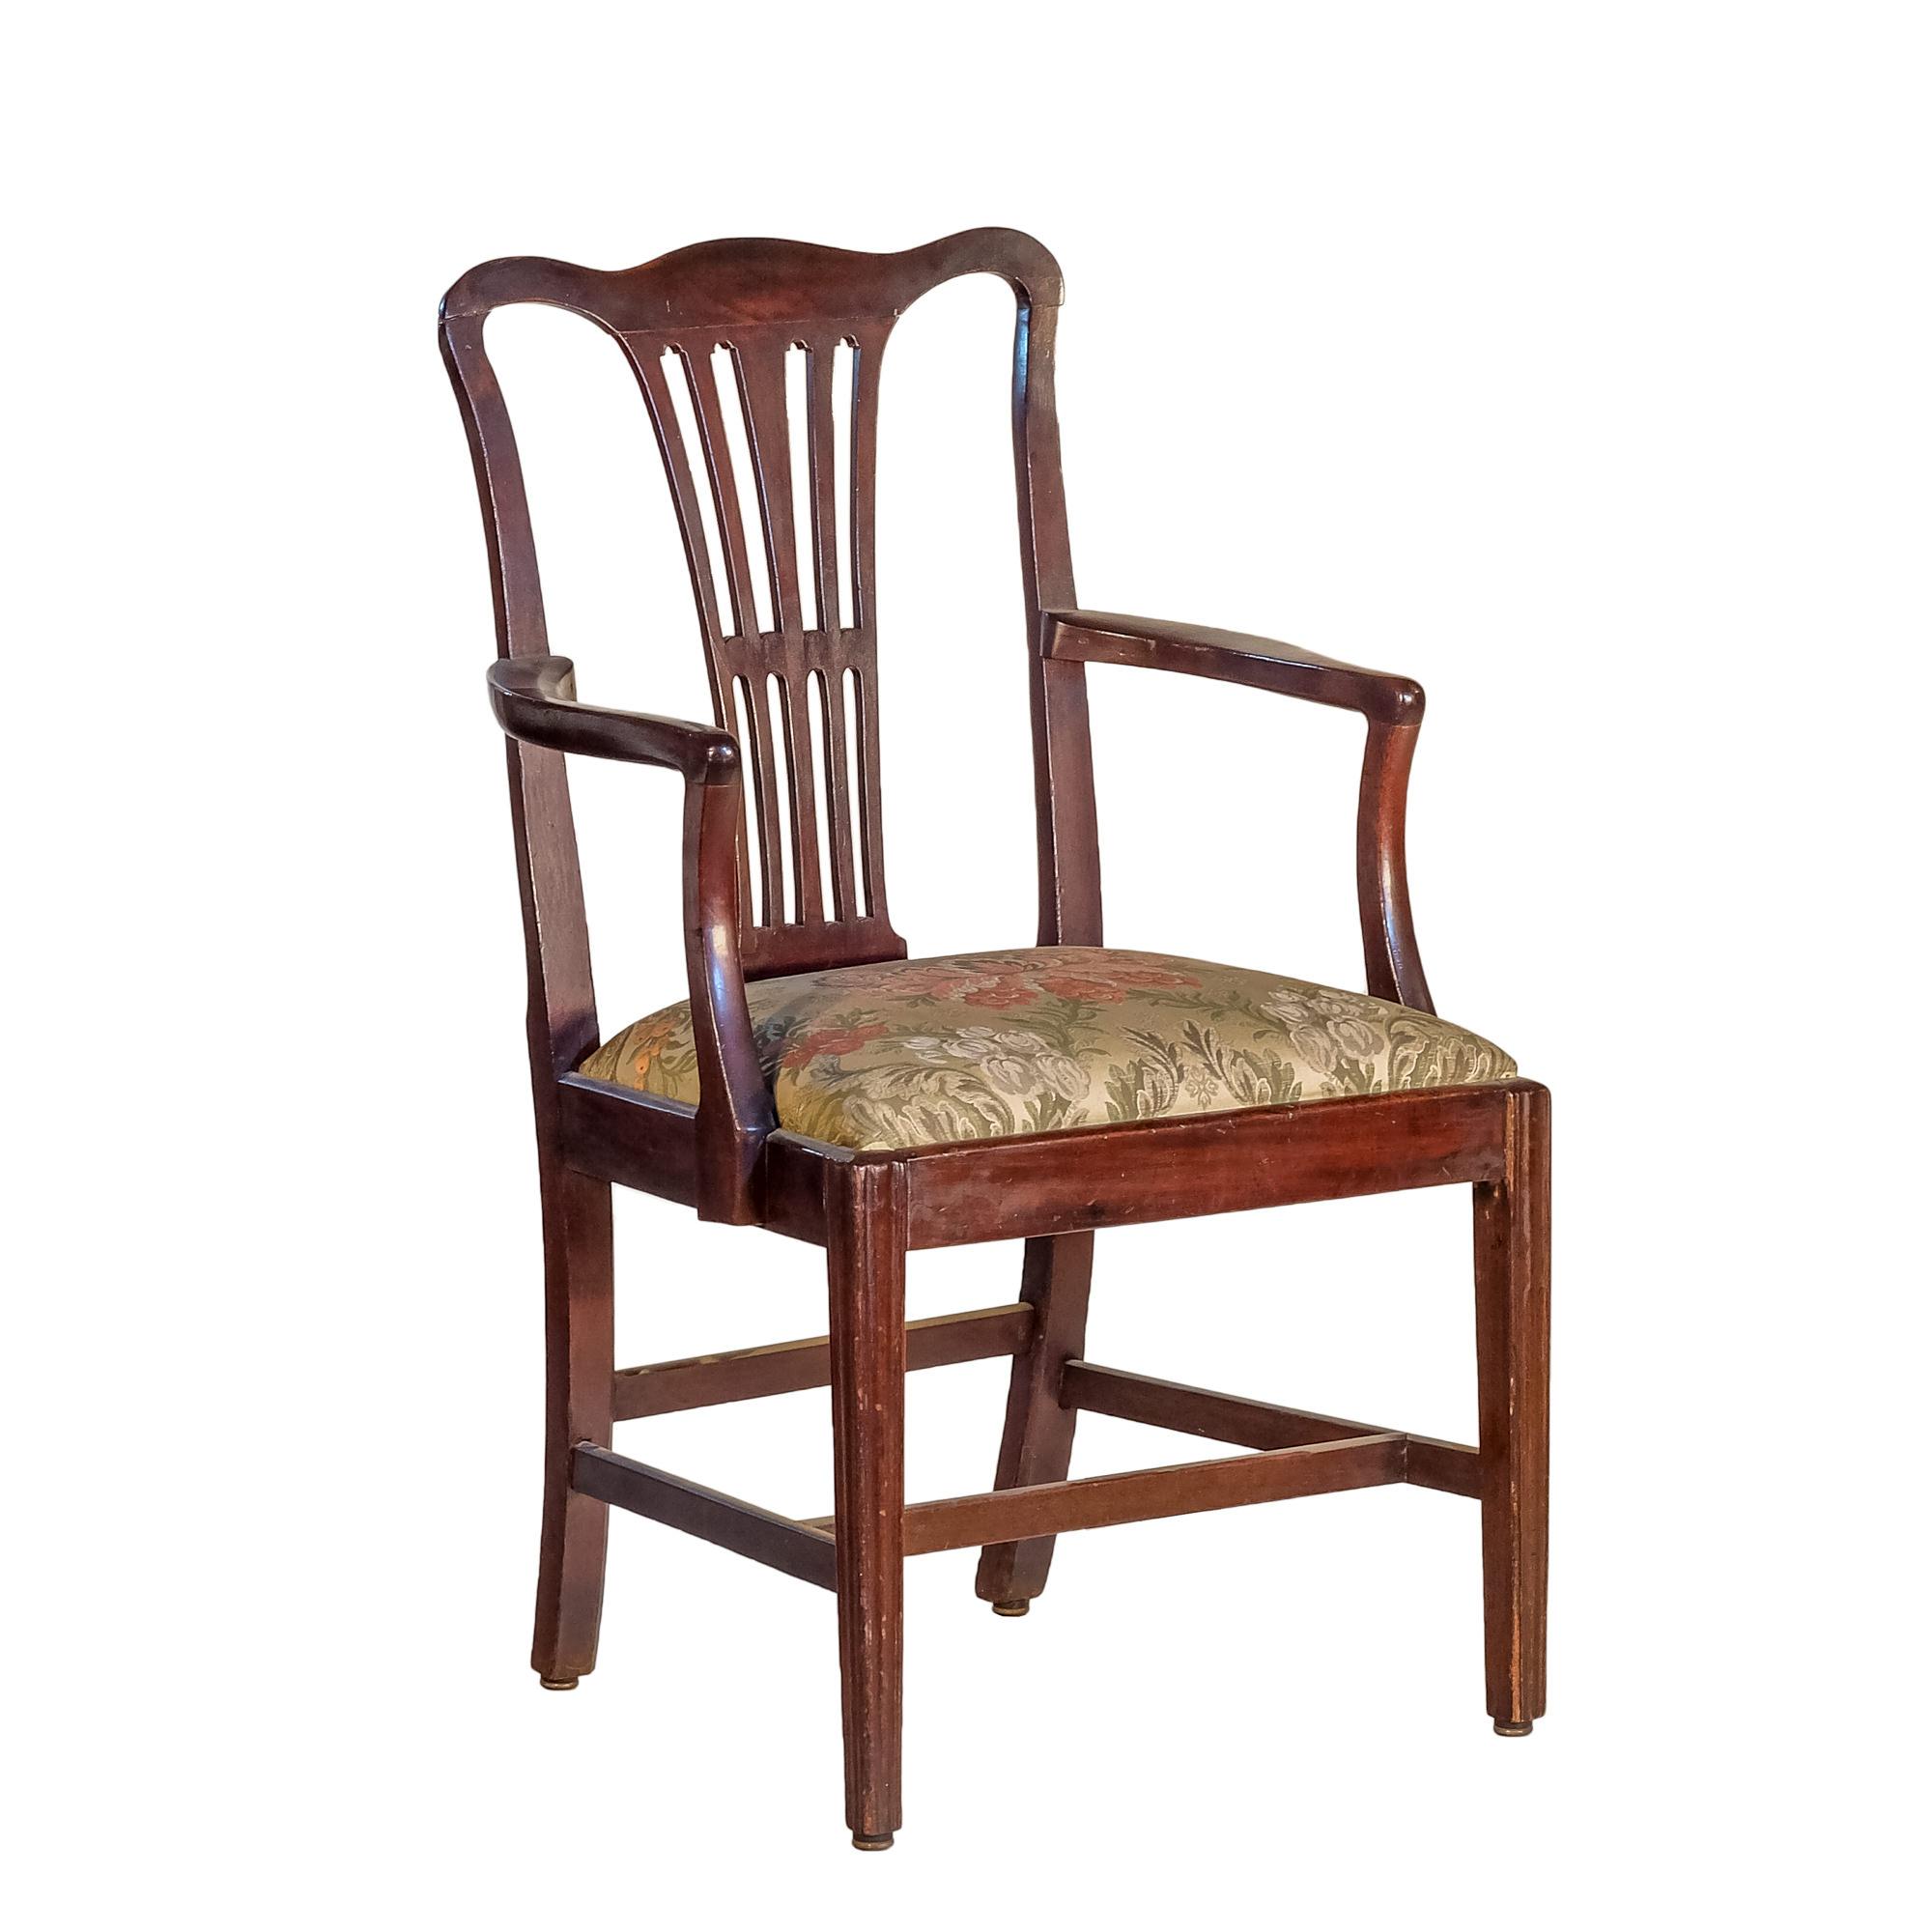 'Georgian Style Mahogany Elbow Chair 19th Century or Earlier'